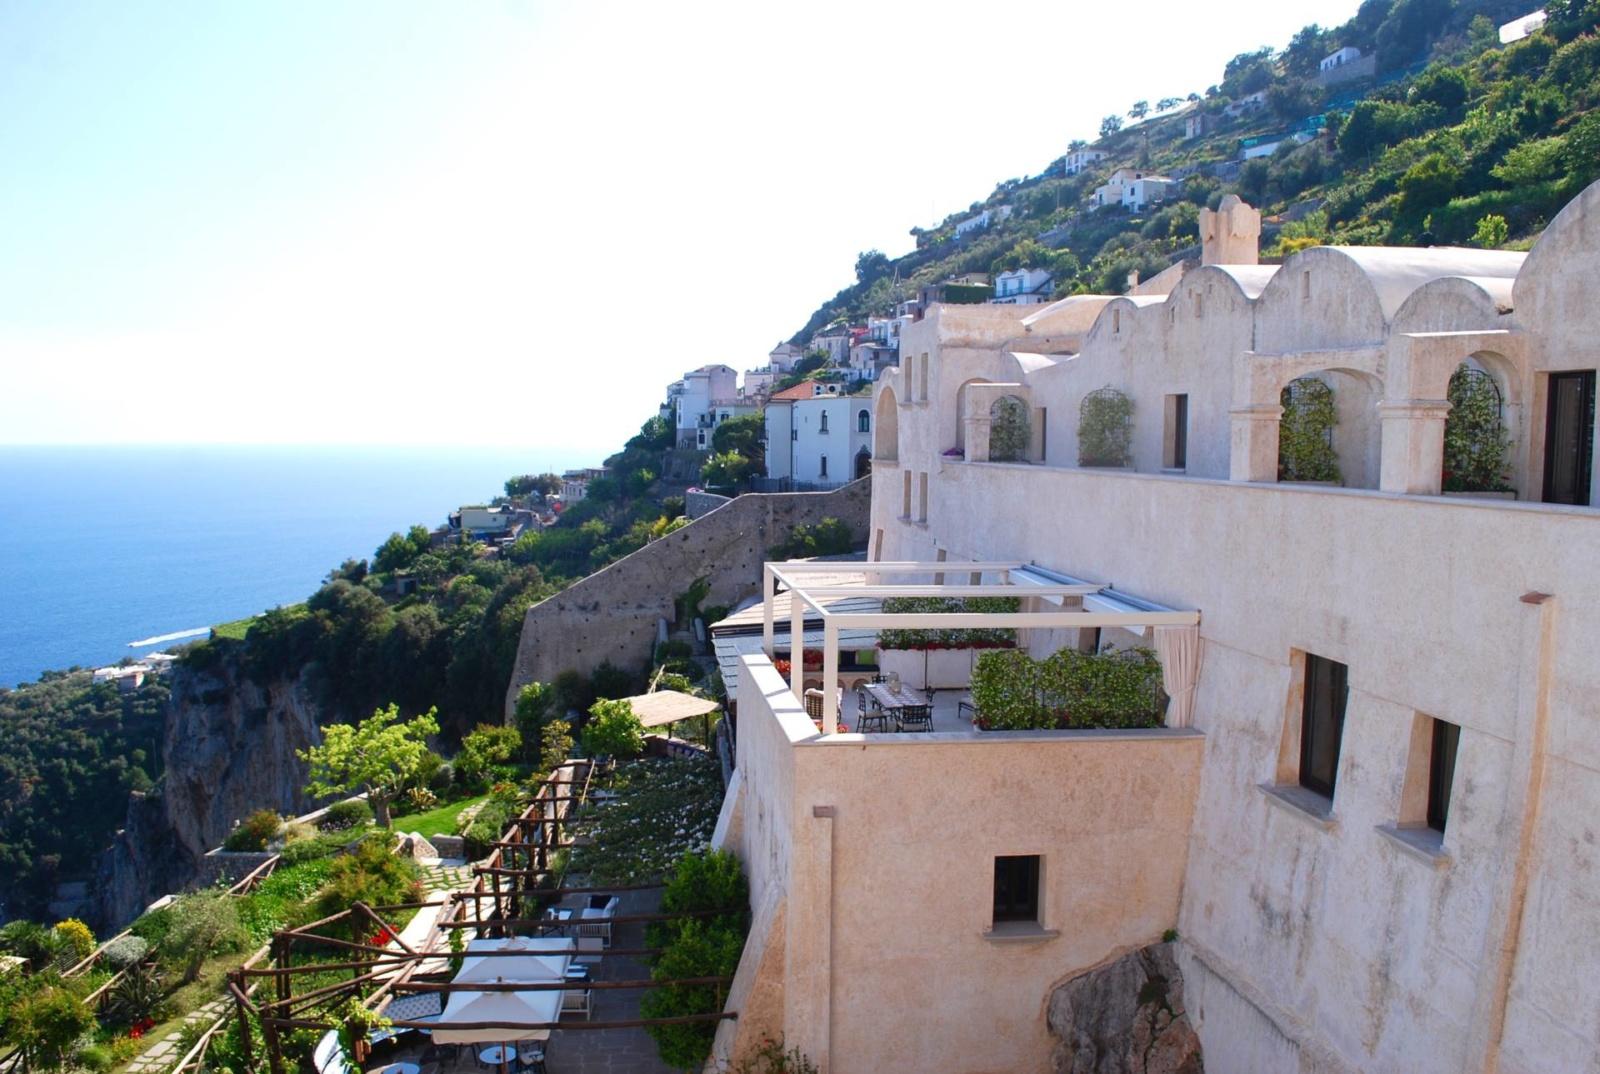 monastero-santa-rosa-amalfi-review12